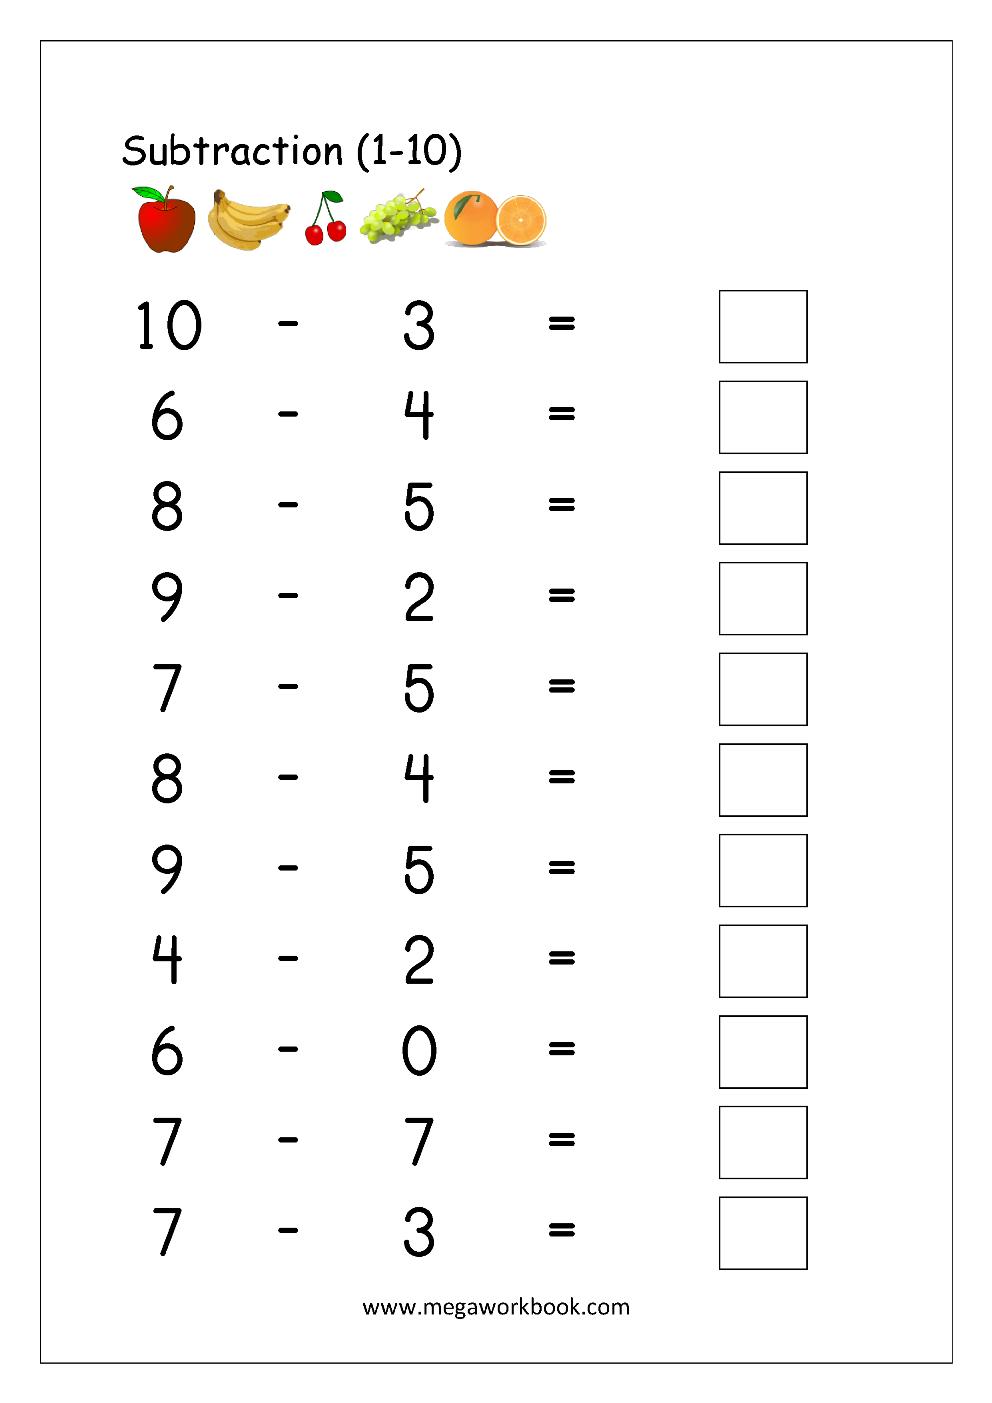 medium resolution of Math Worksheet - Subtraction (1-10)   Math subtraction worksheets